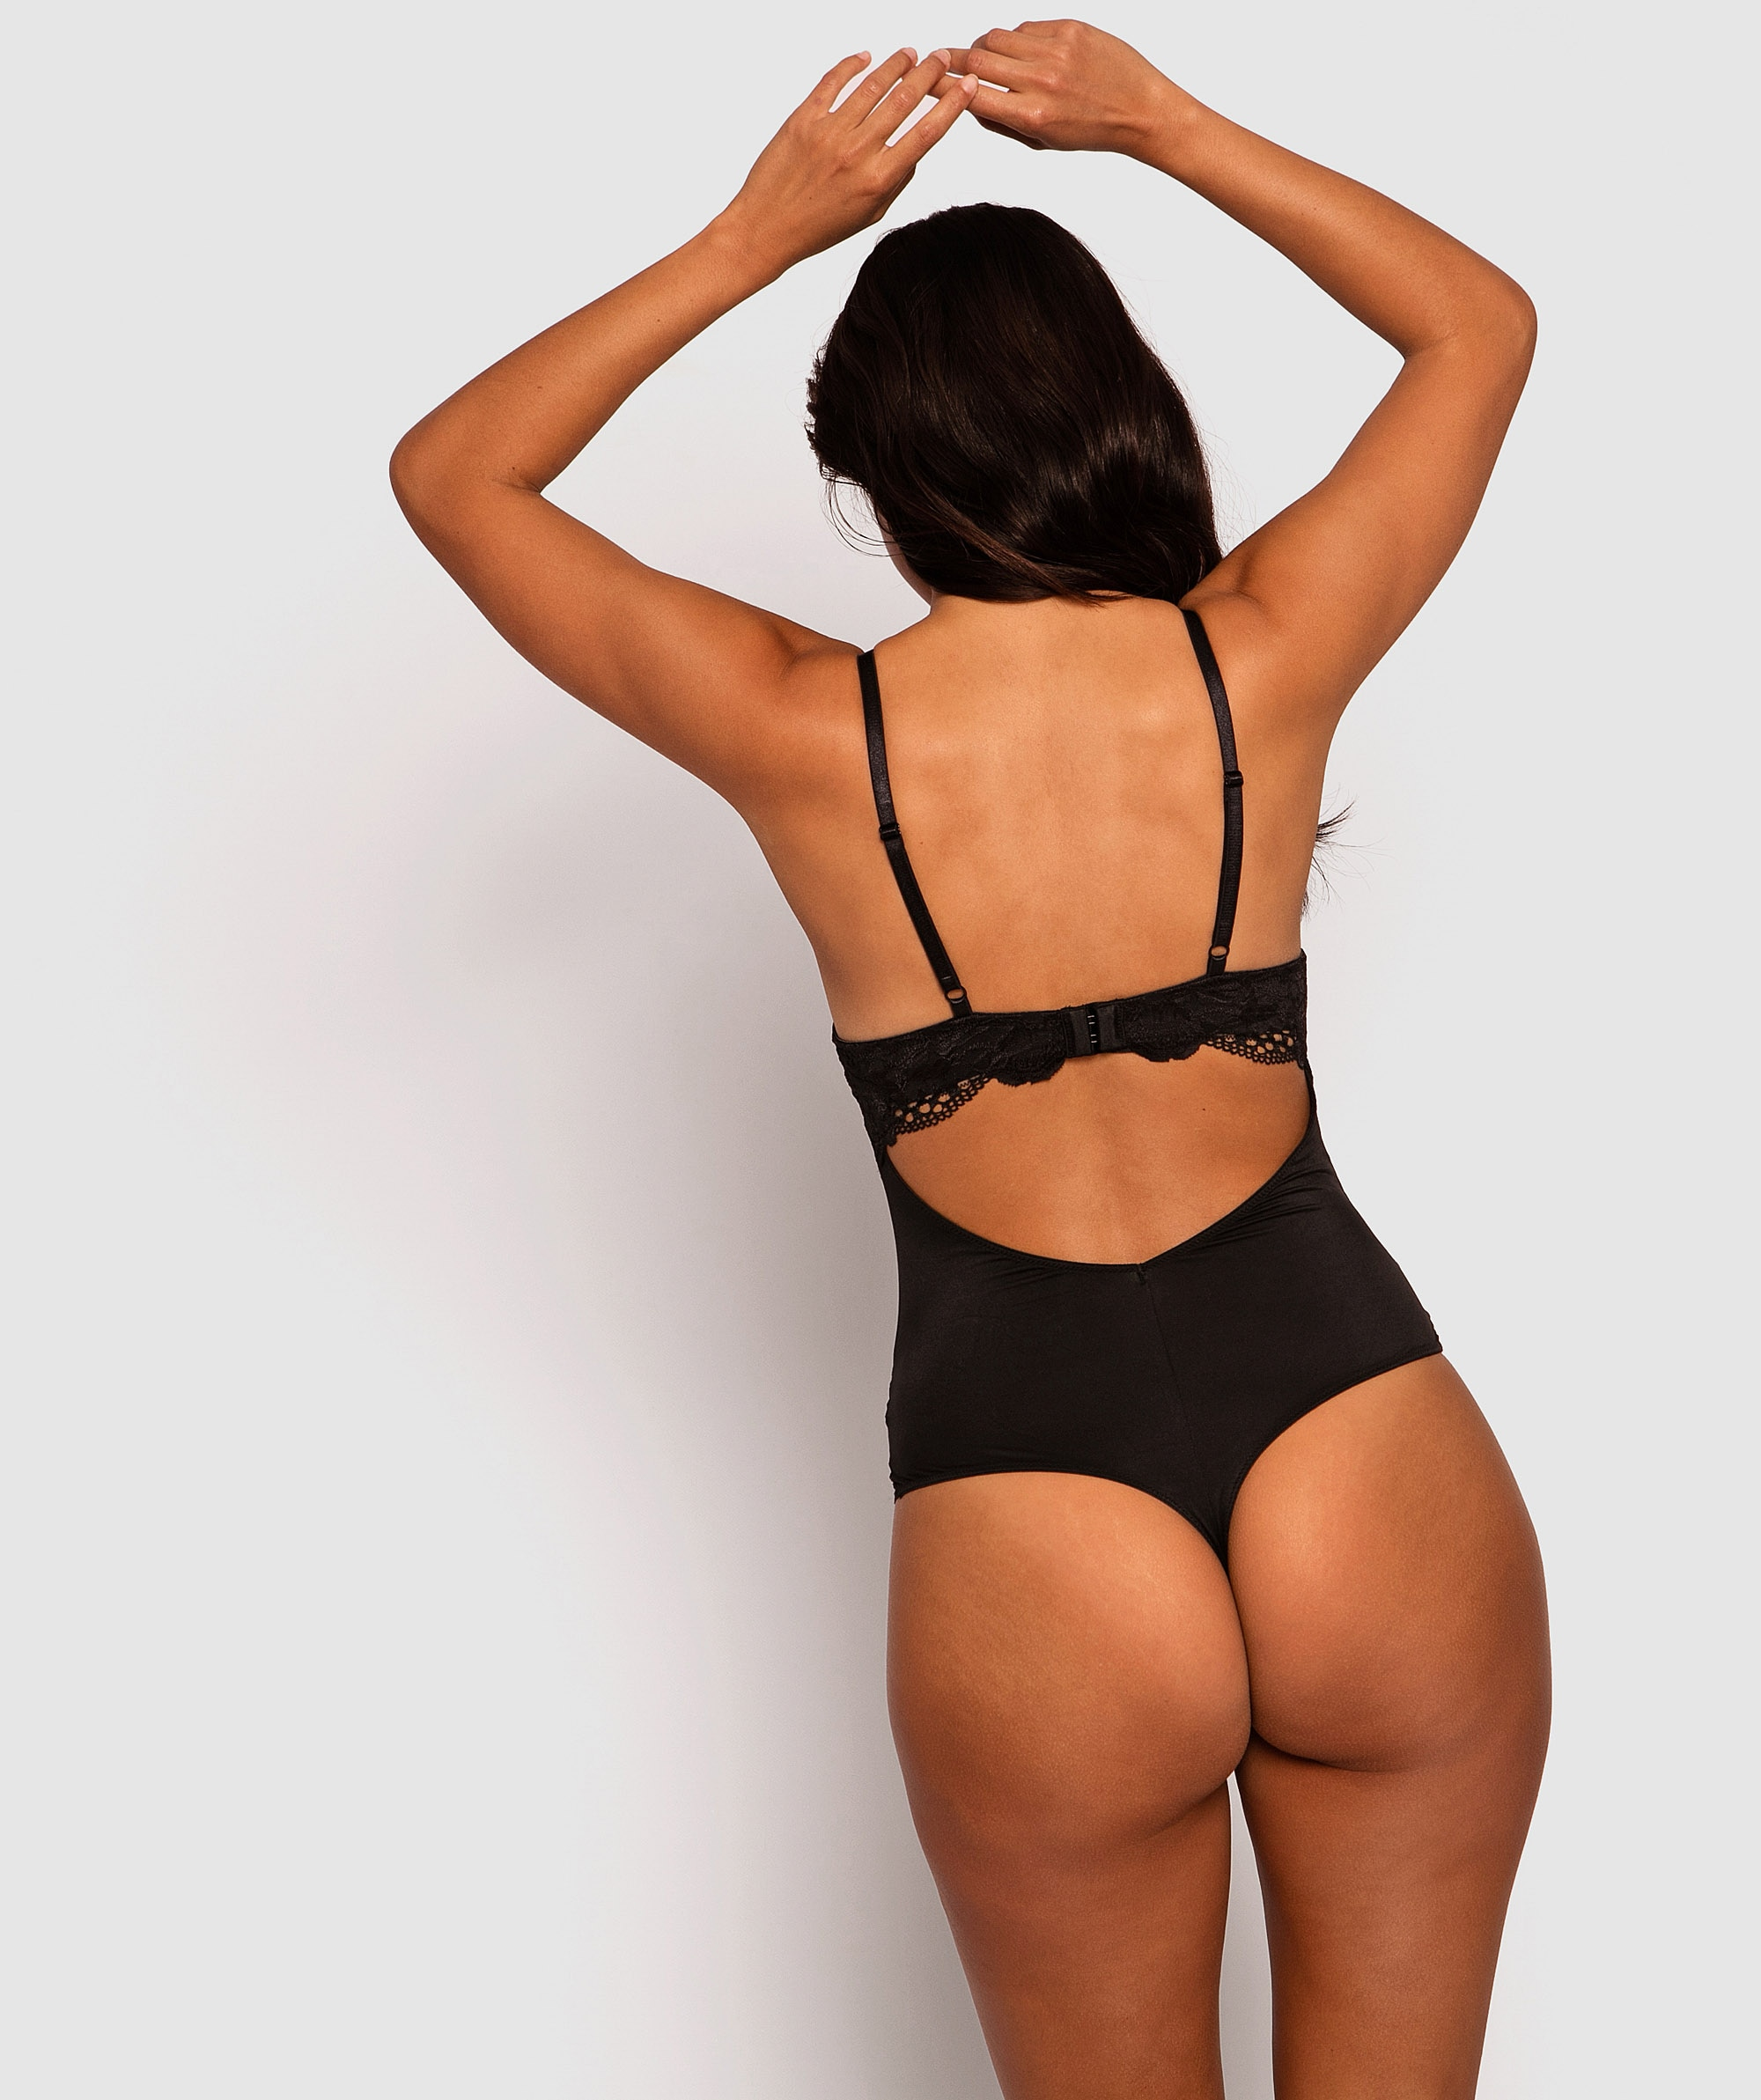 Style By Day Balconette Hope Push Up Bodysuit - Black